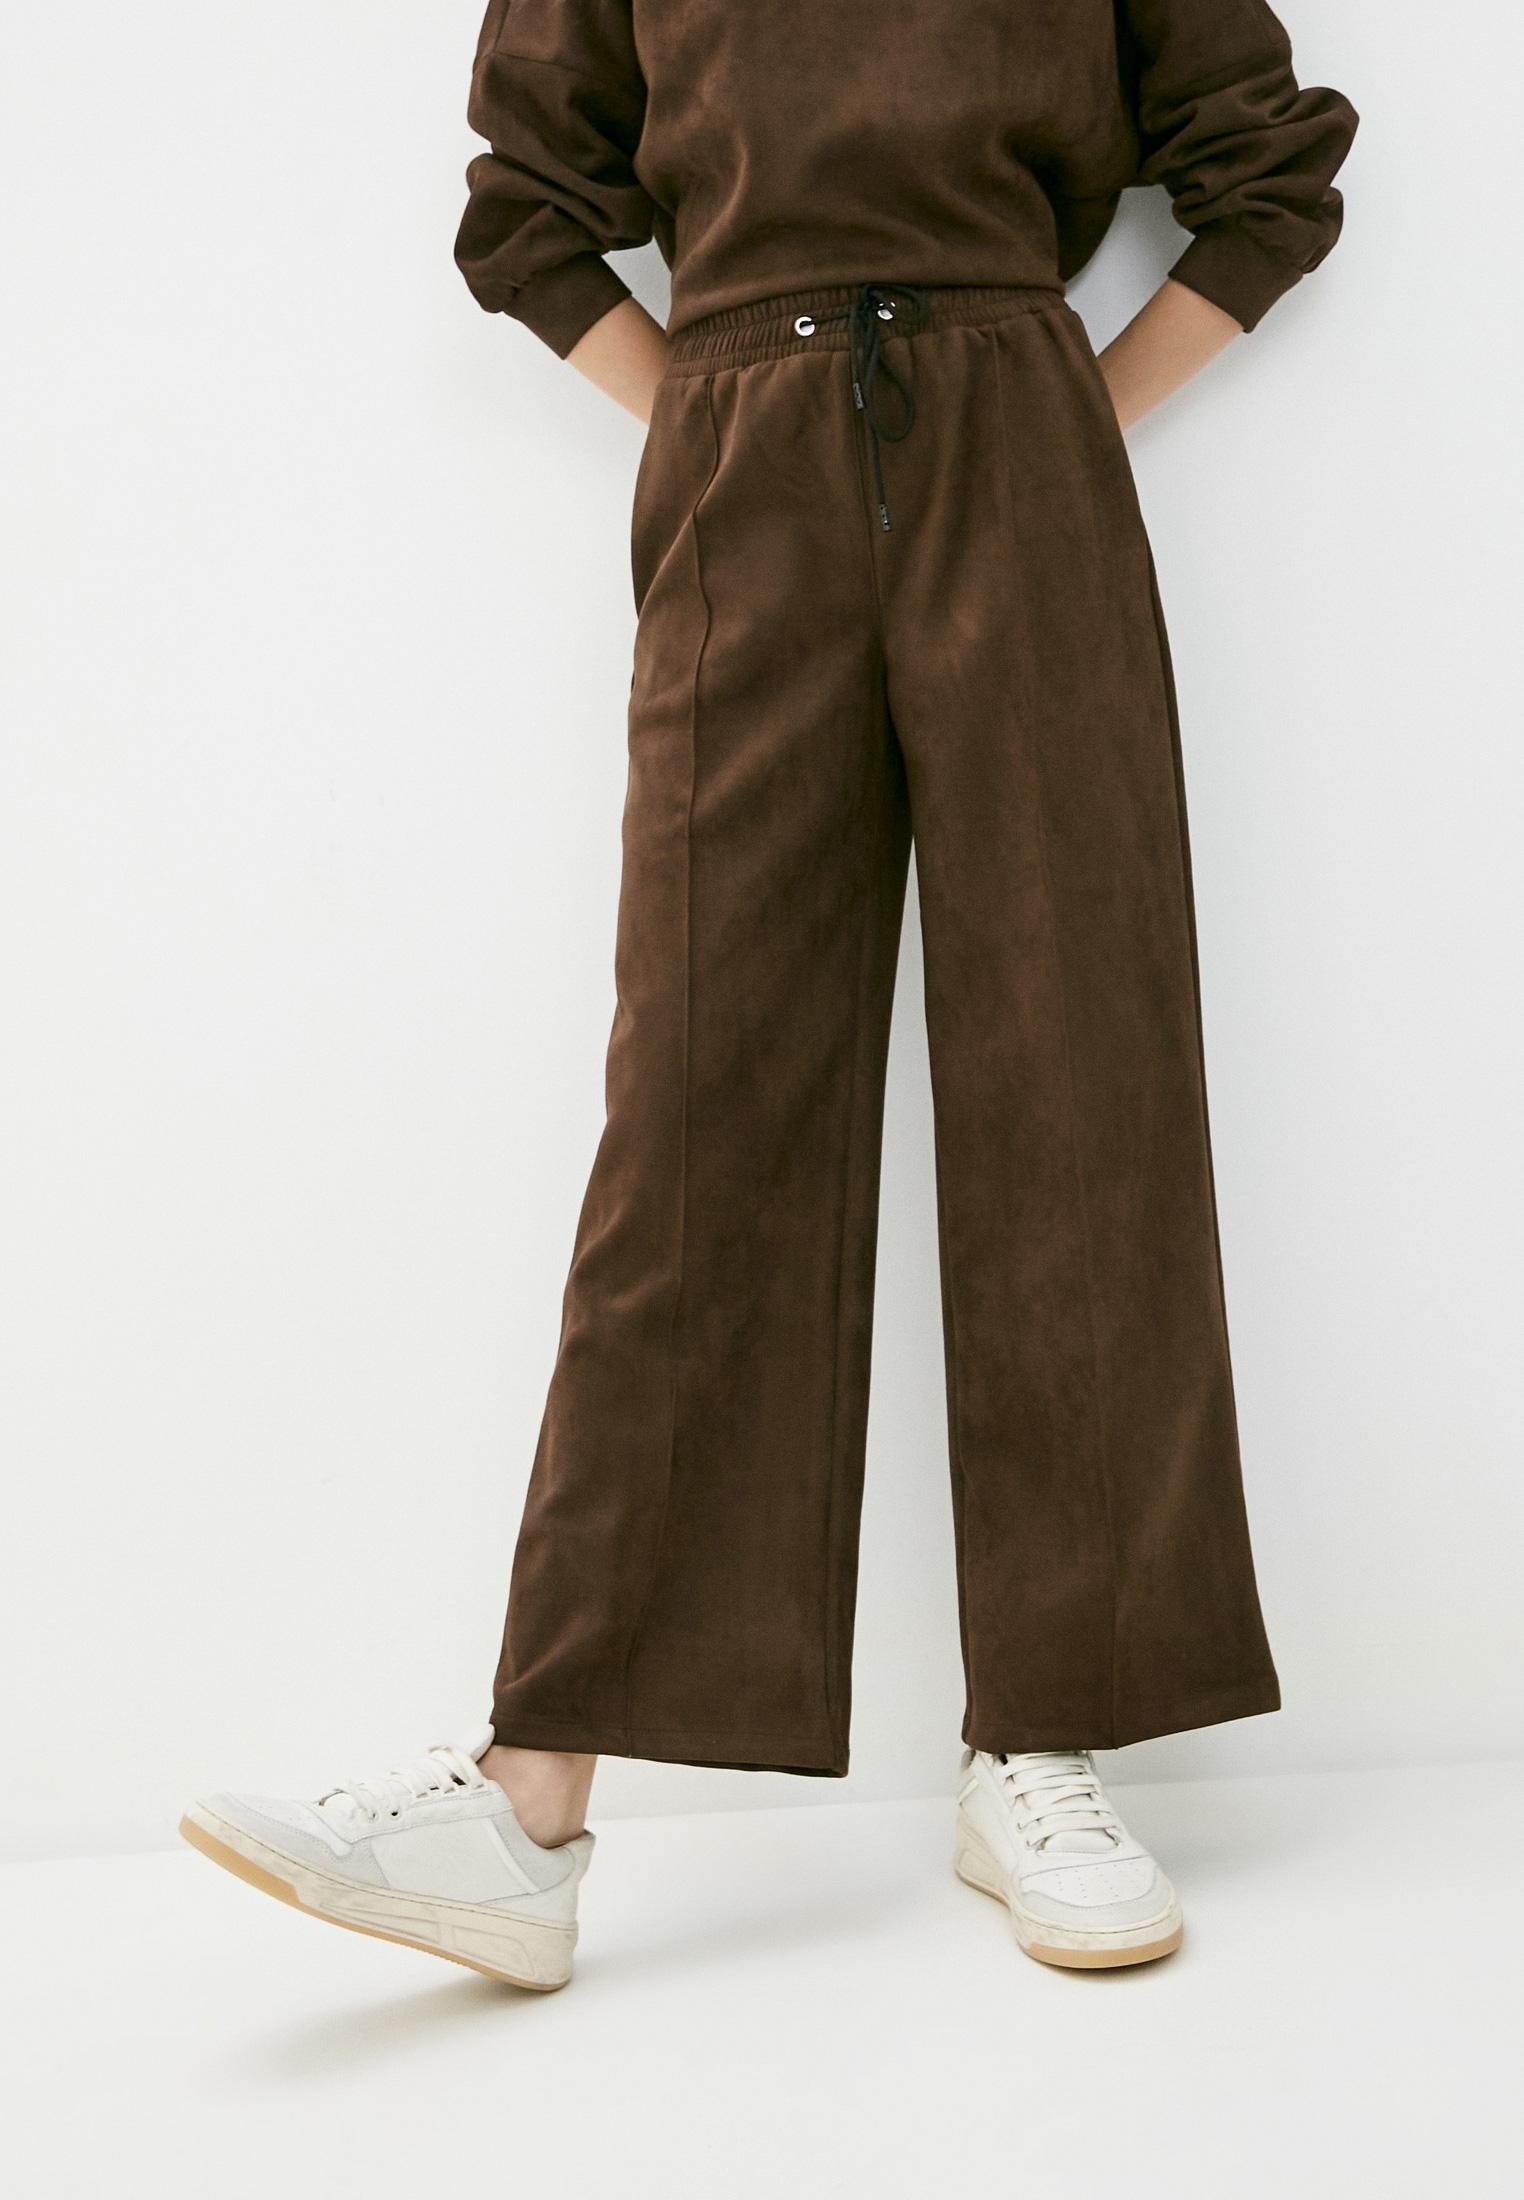 Костюм с брюками Nerouge N1254-1: изображение 5